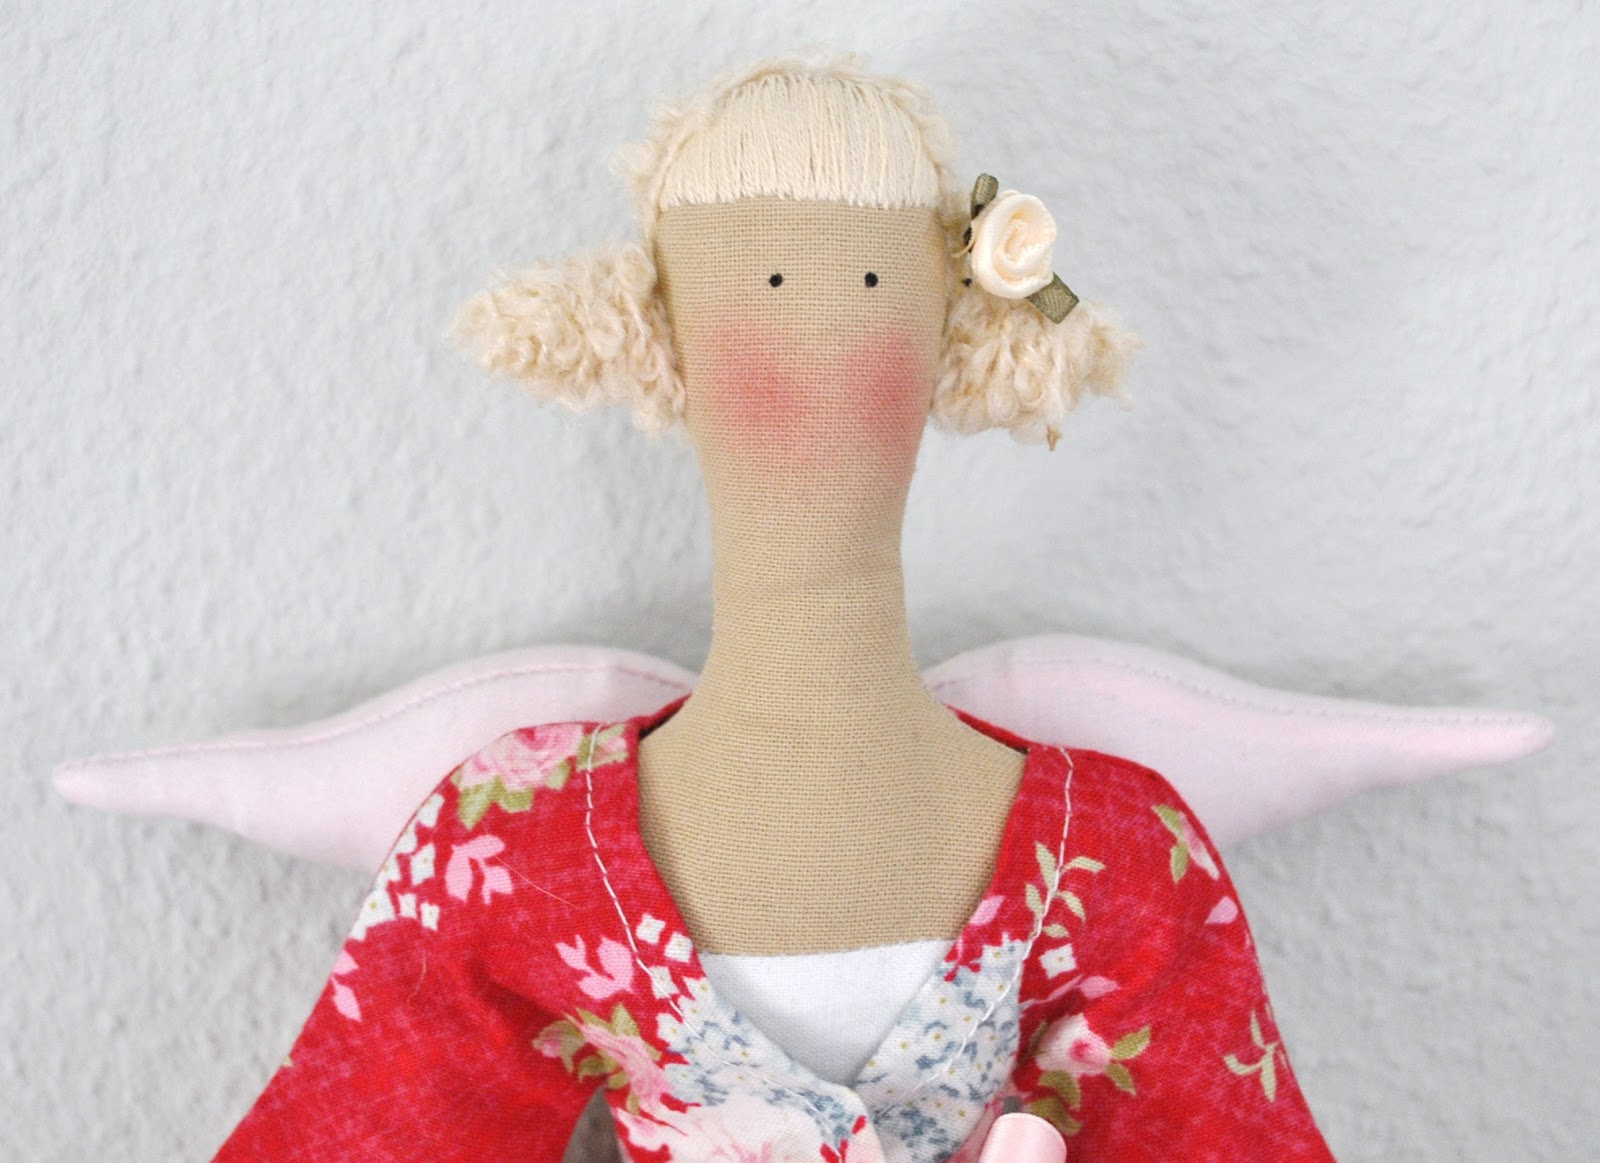 Bines Stoffwerkstatt Tilda Engel